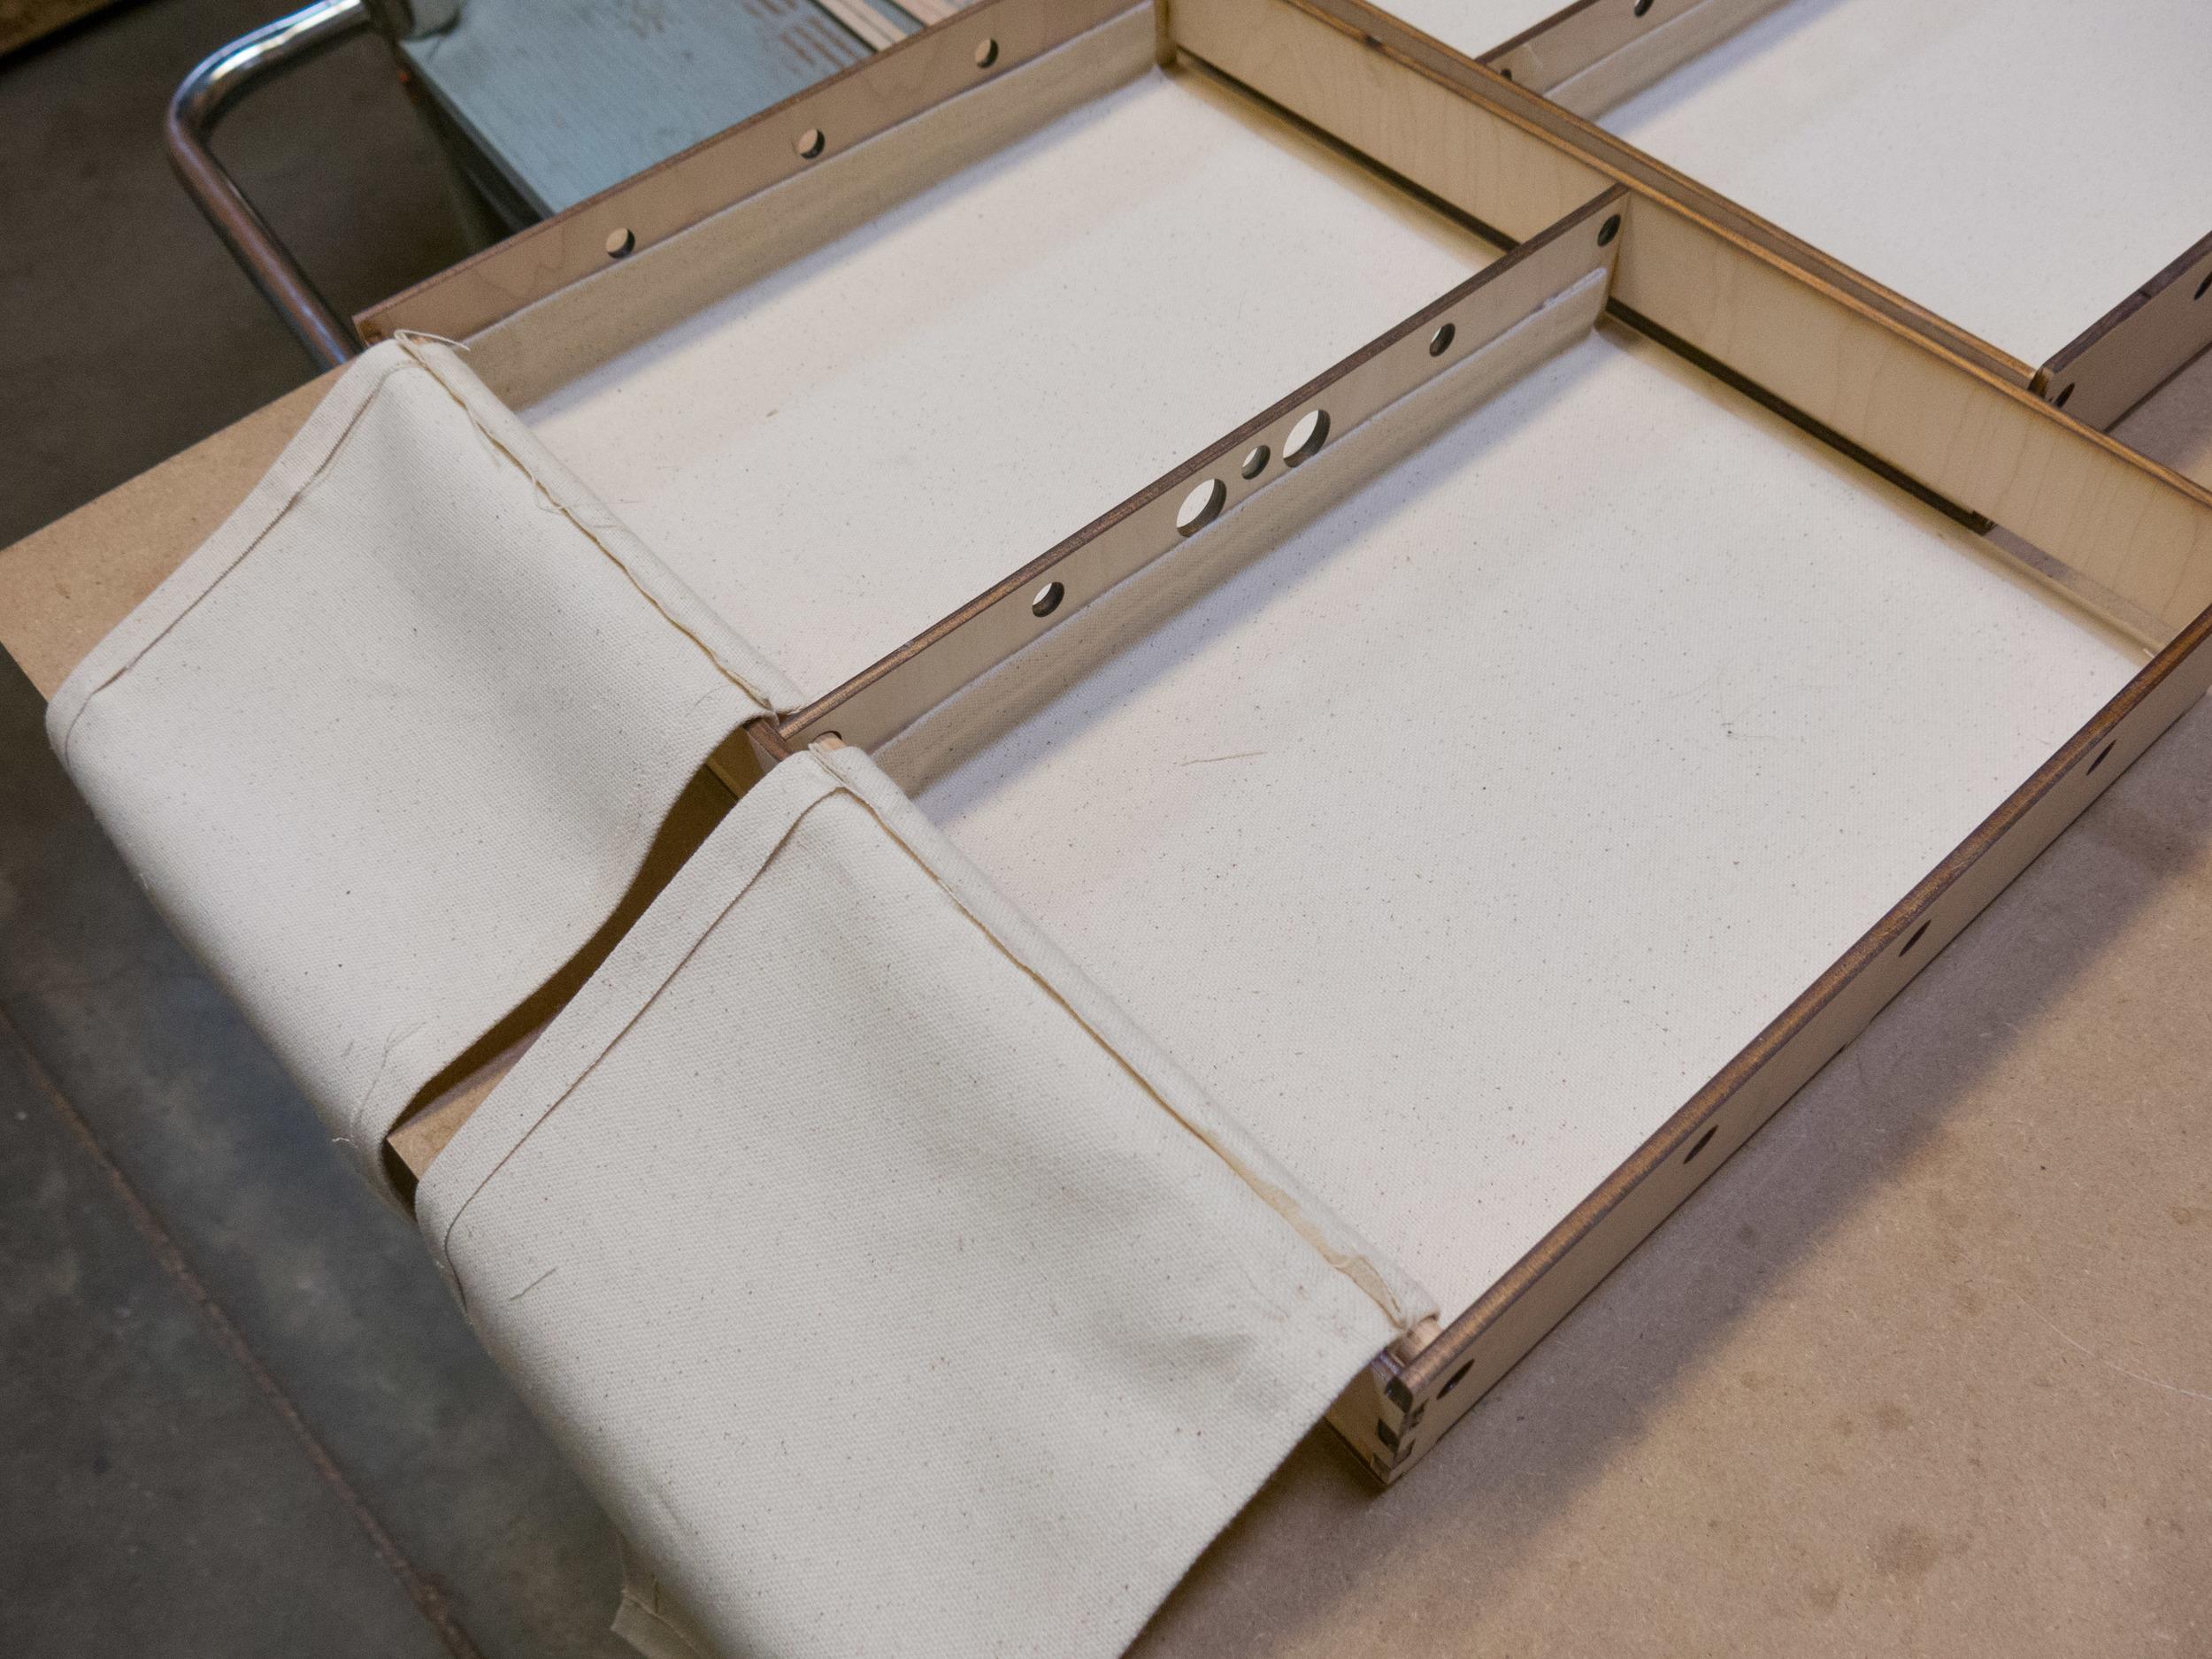 Fabric step 2 - starting the 'hammocks'